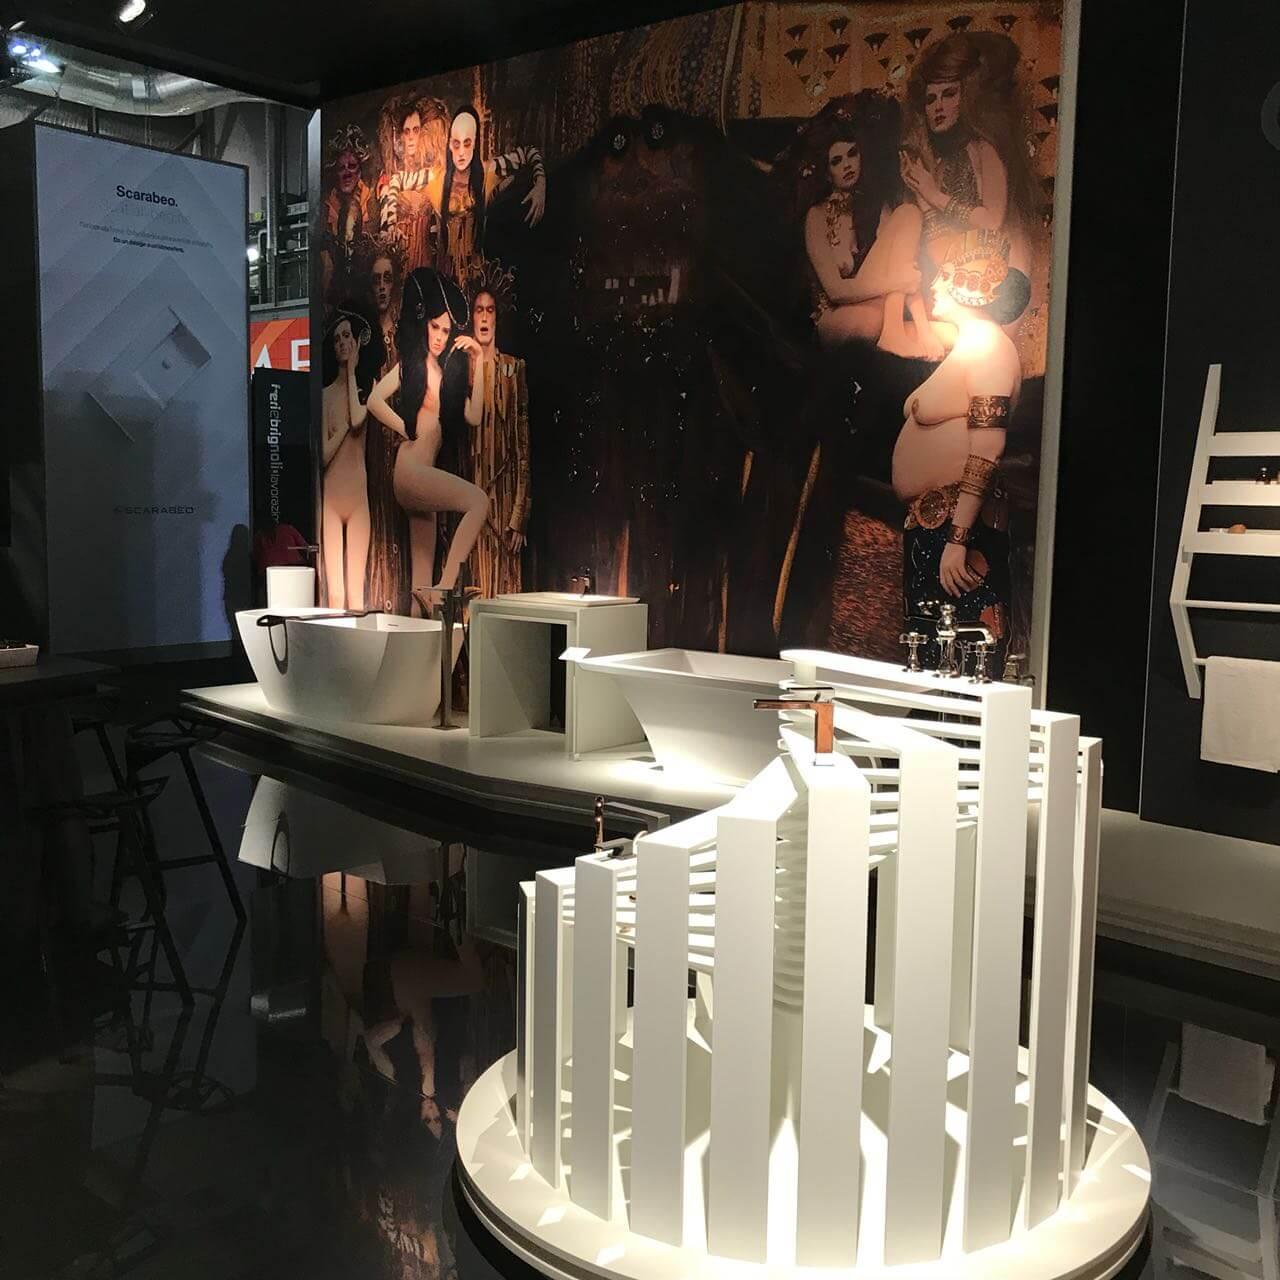 Contemporary Bathroom Designs, Graff Armaturen,Graff Badezimmer, Graff Dusche, Aqua-Sense Dusch-Kollektionen, Produkte GRAFF, Waschtischarmatur Graff , Graff sento, Graff luna, Graff ametis